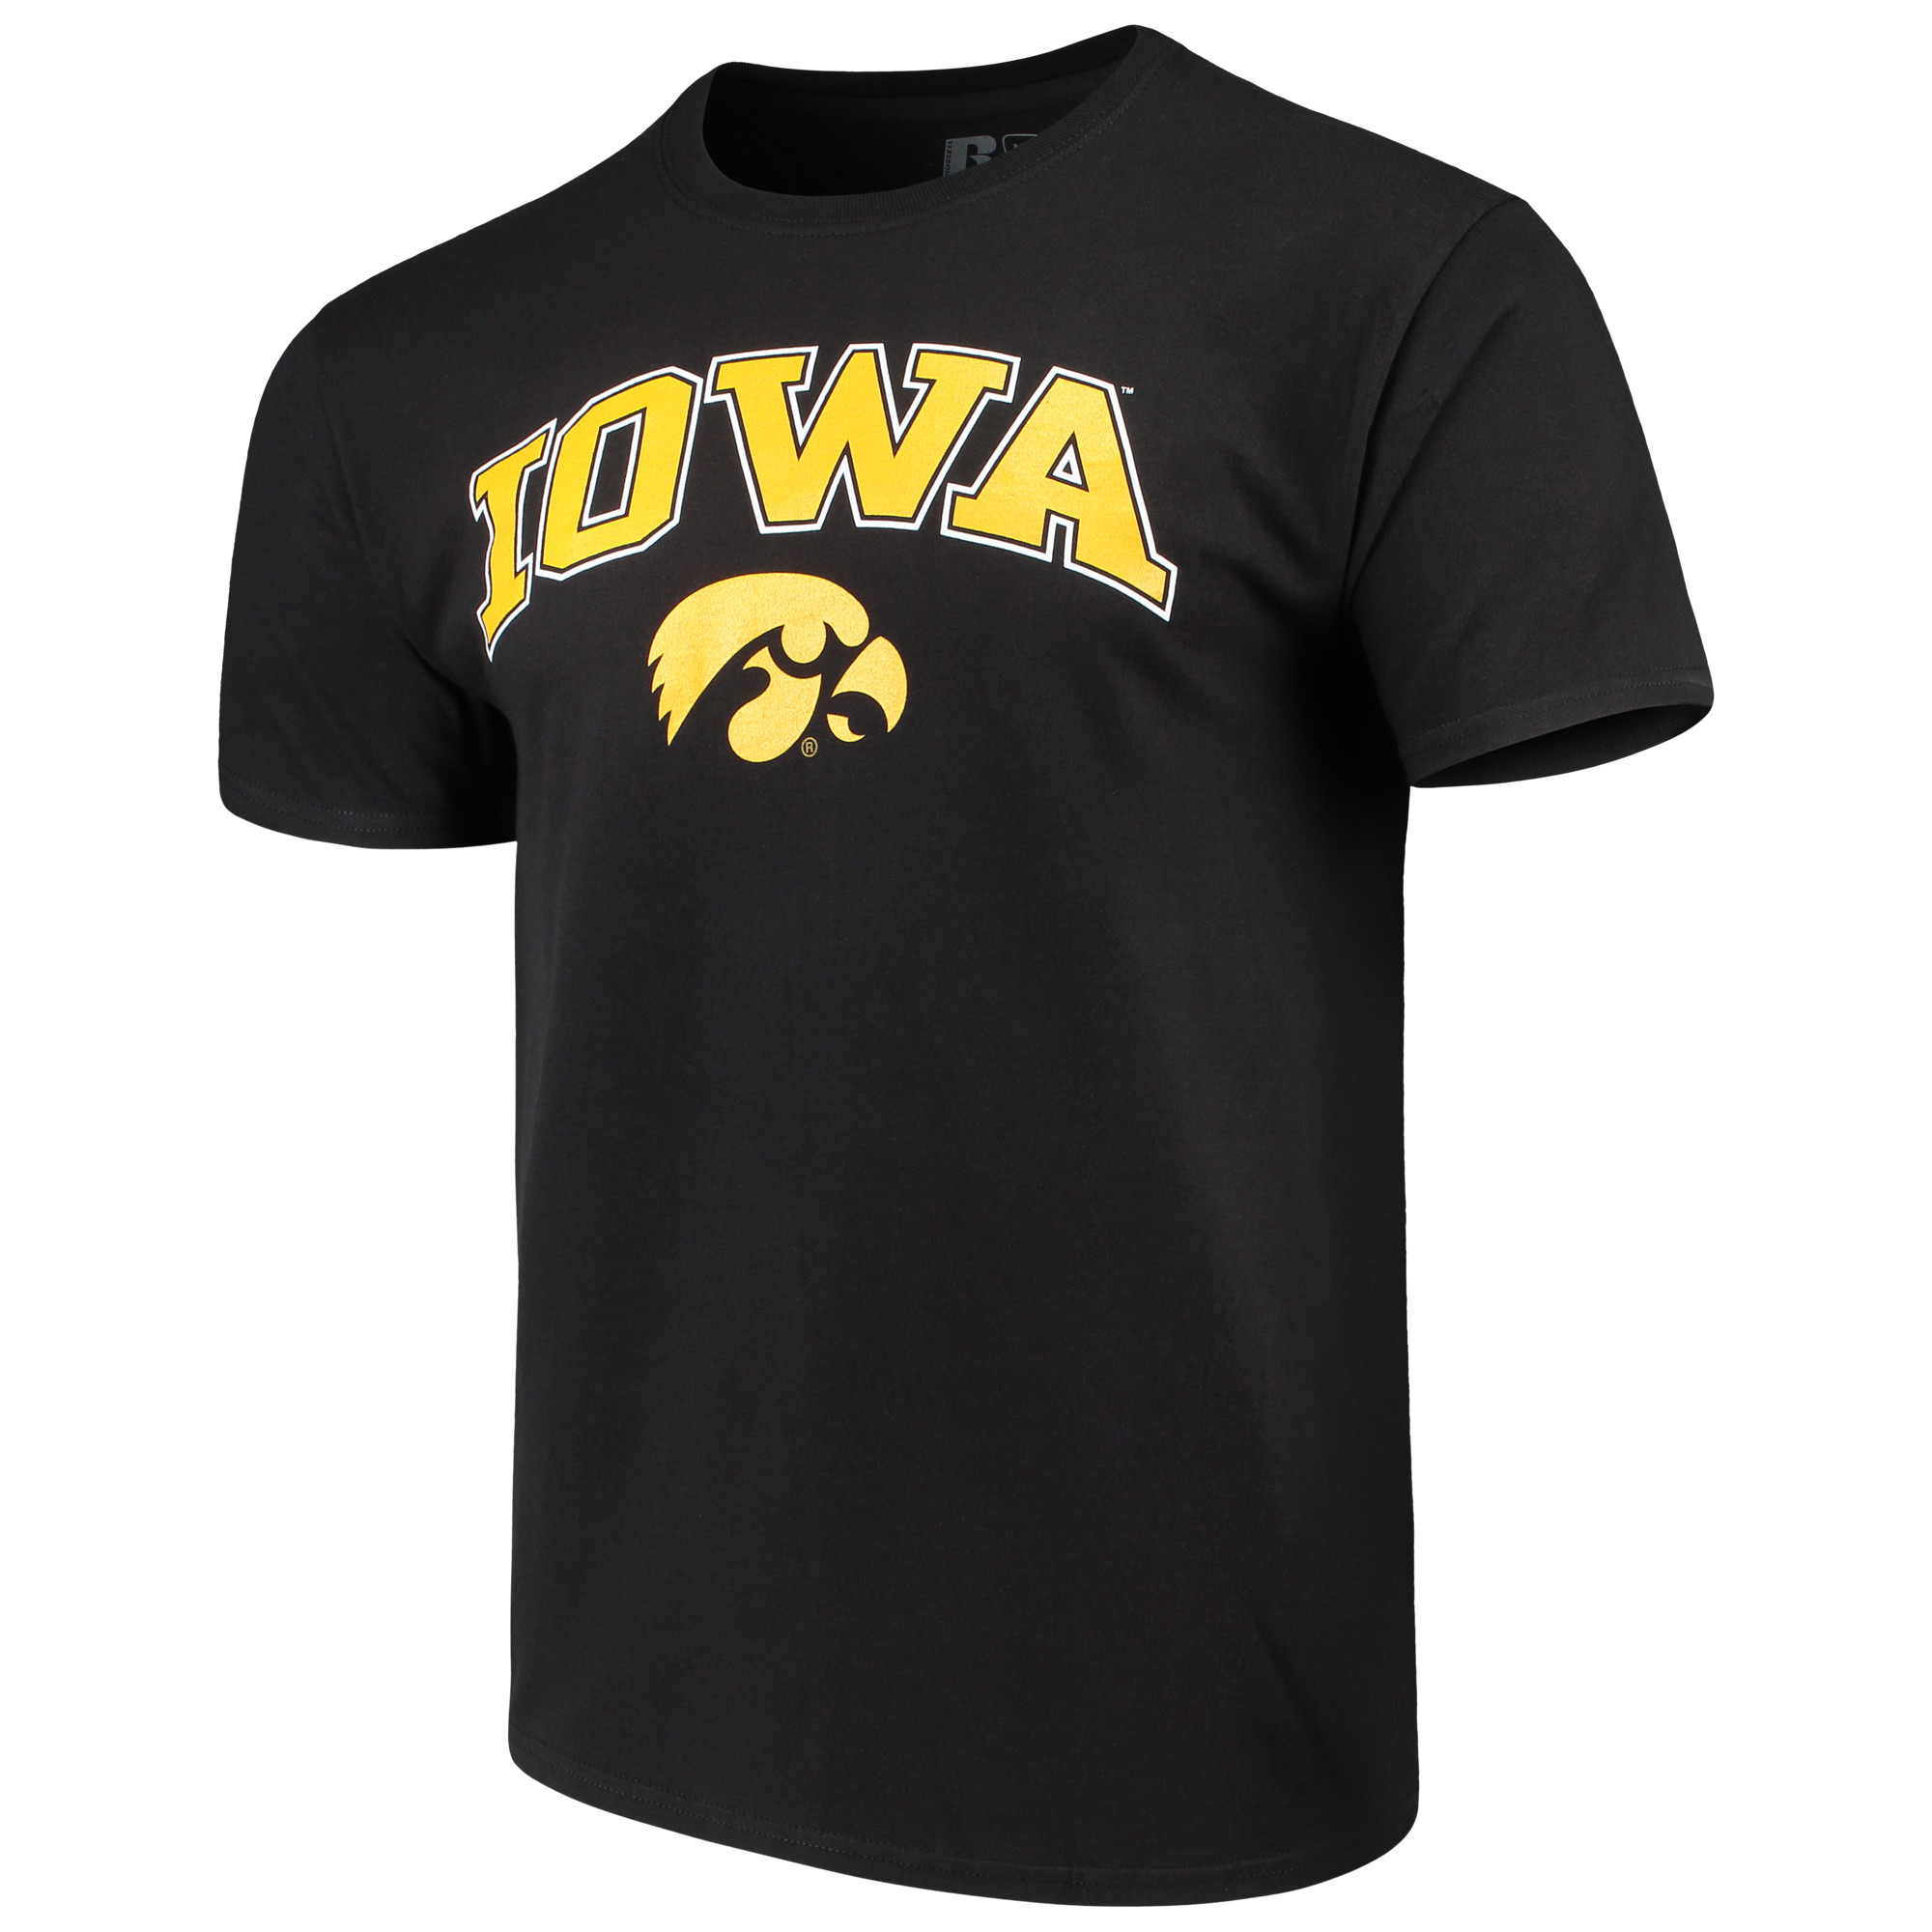 Men's Russell Black Iowa Hawkeyes Crew Core Print T-Shirt